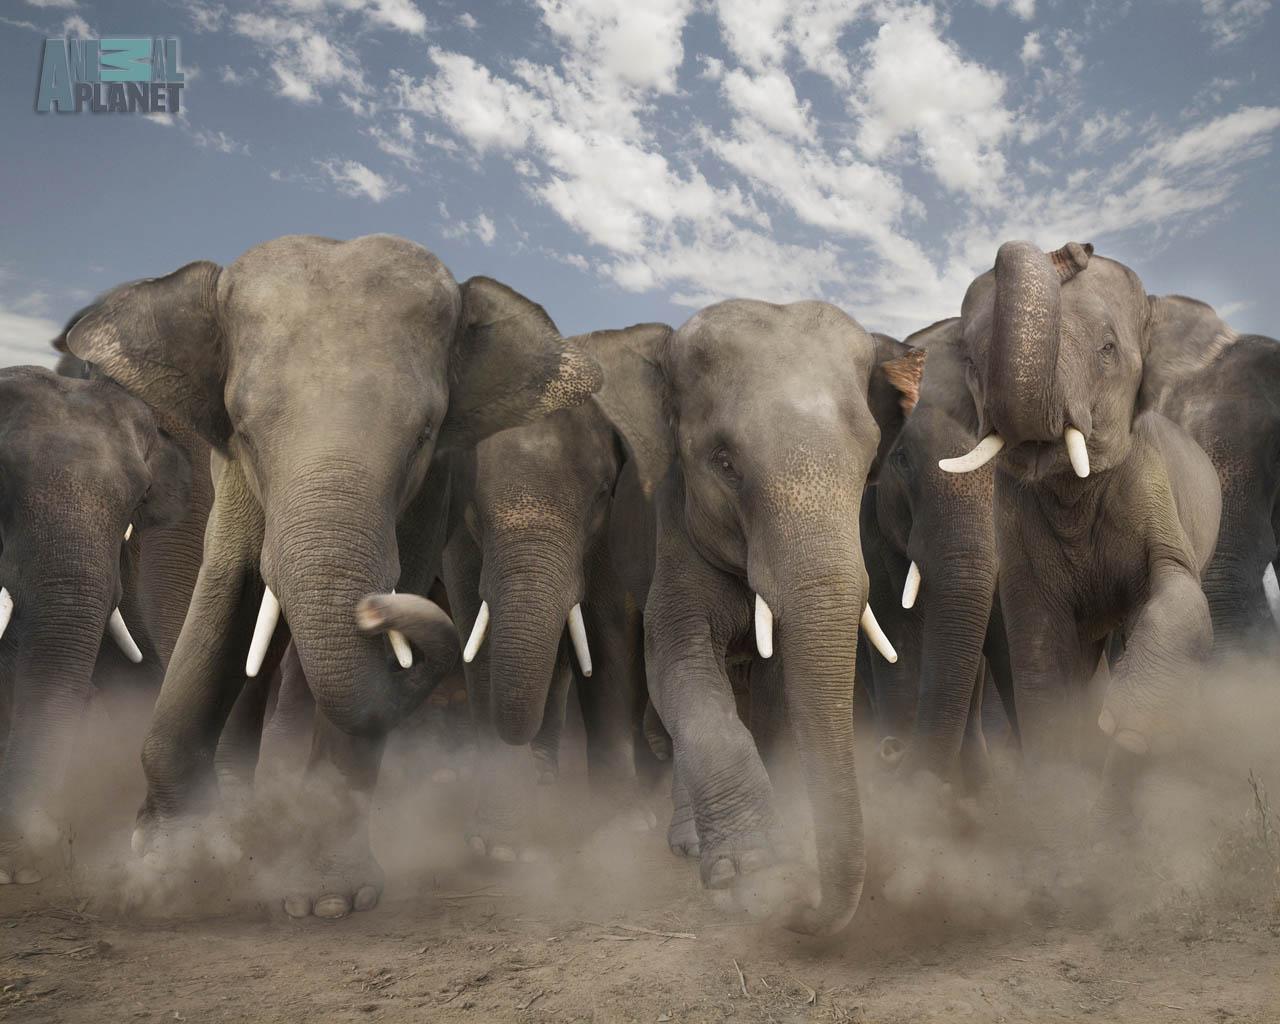 Image gallary 3 beautiful elephant wallpapers for desktop - Image elephant ...